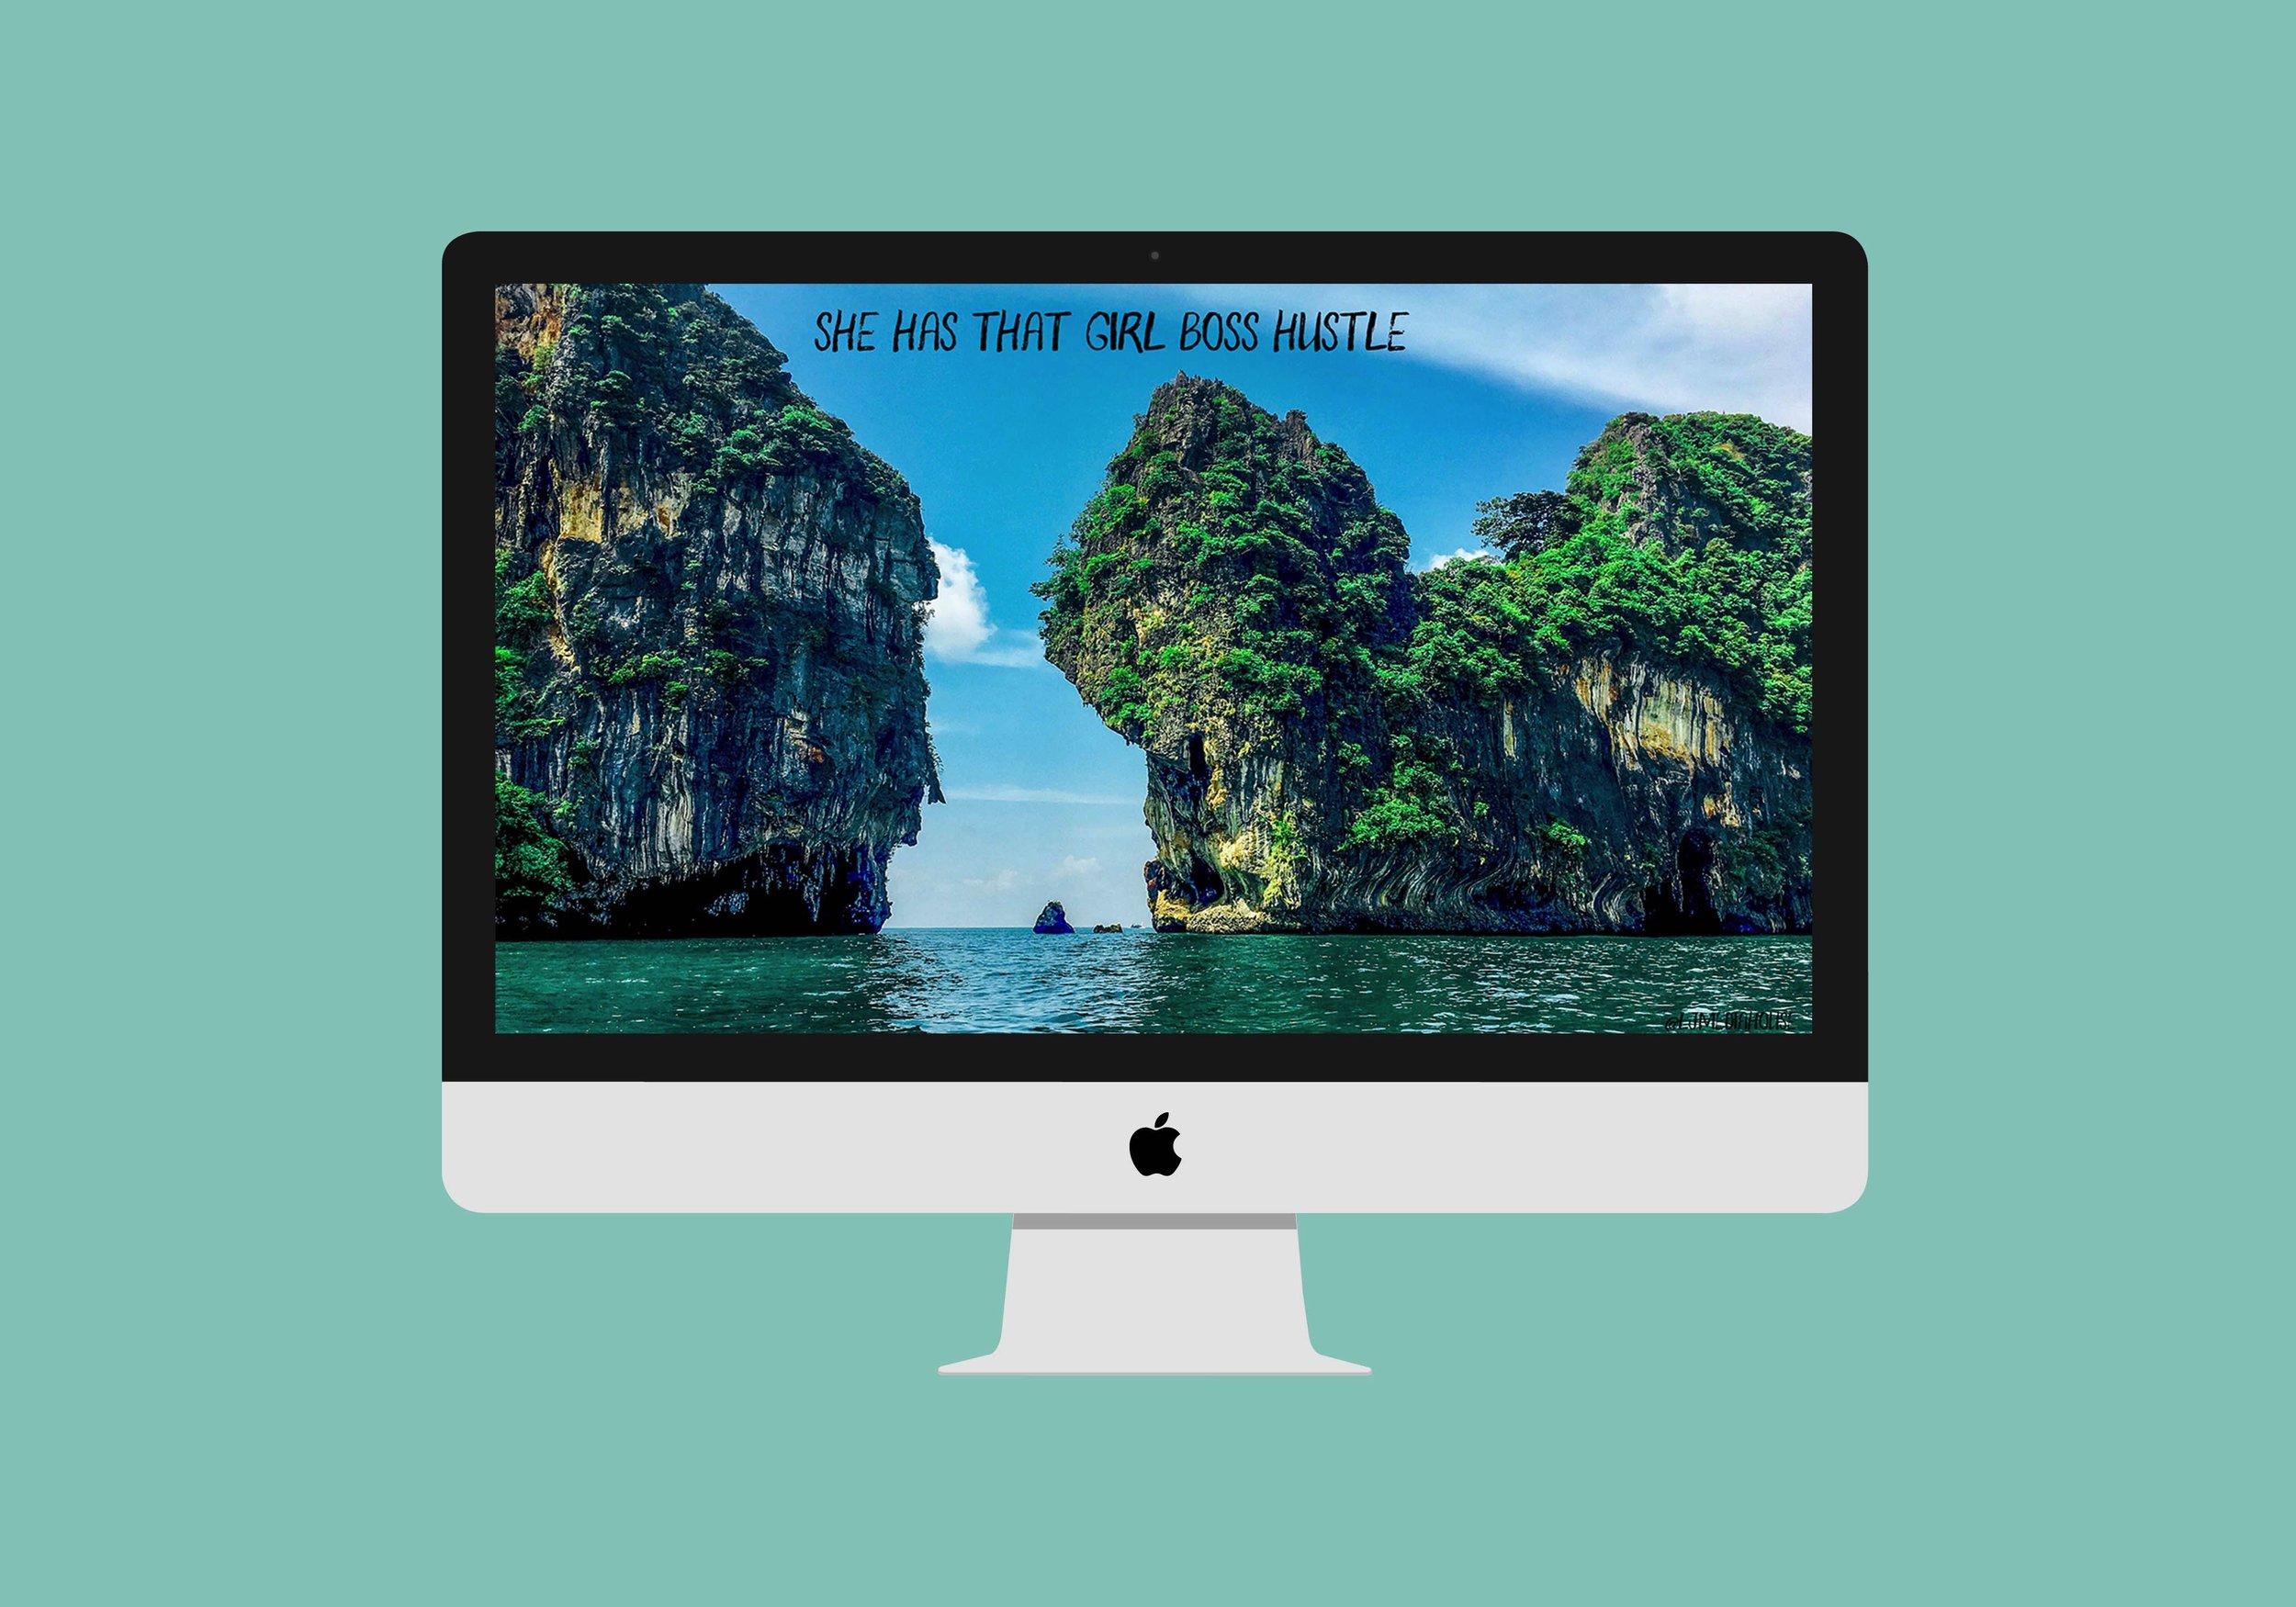 Desktop Wallpaper 5